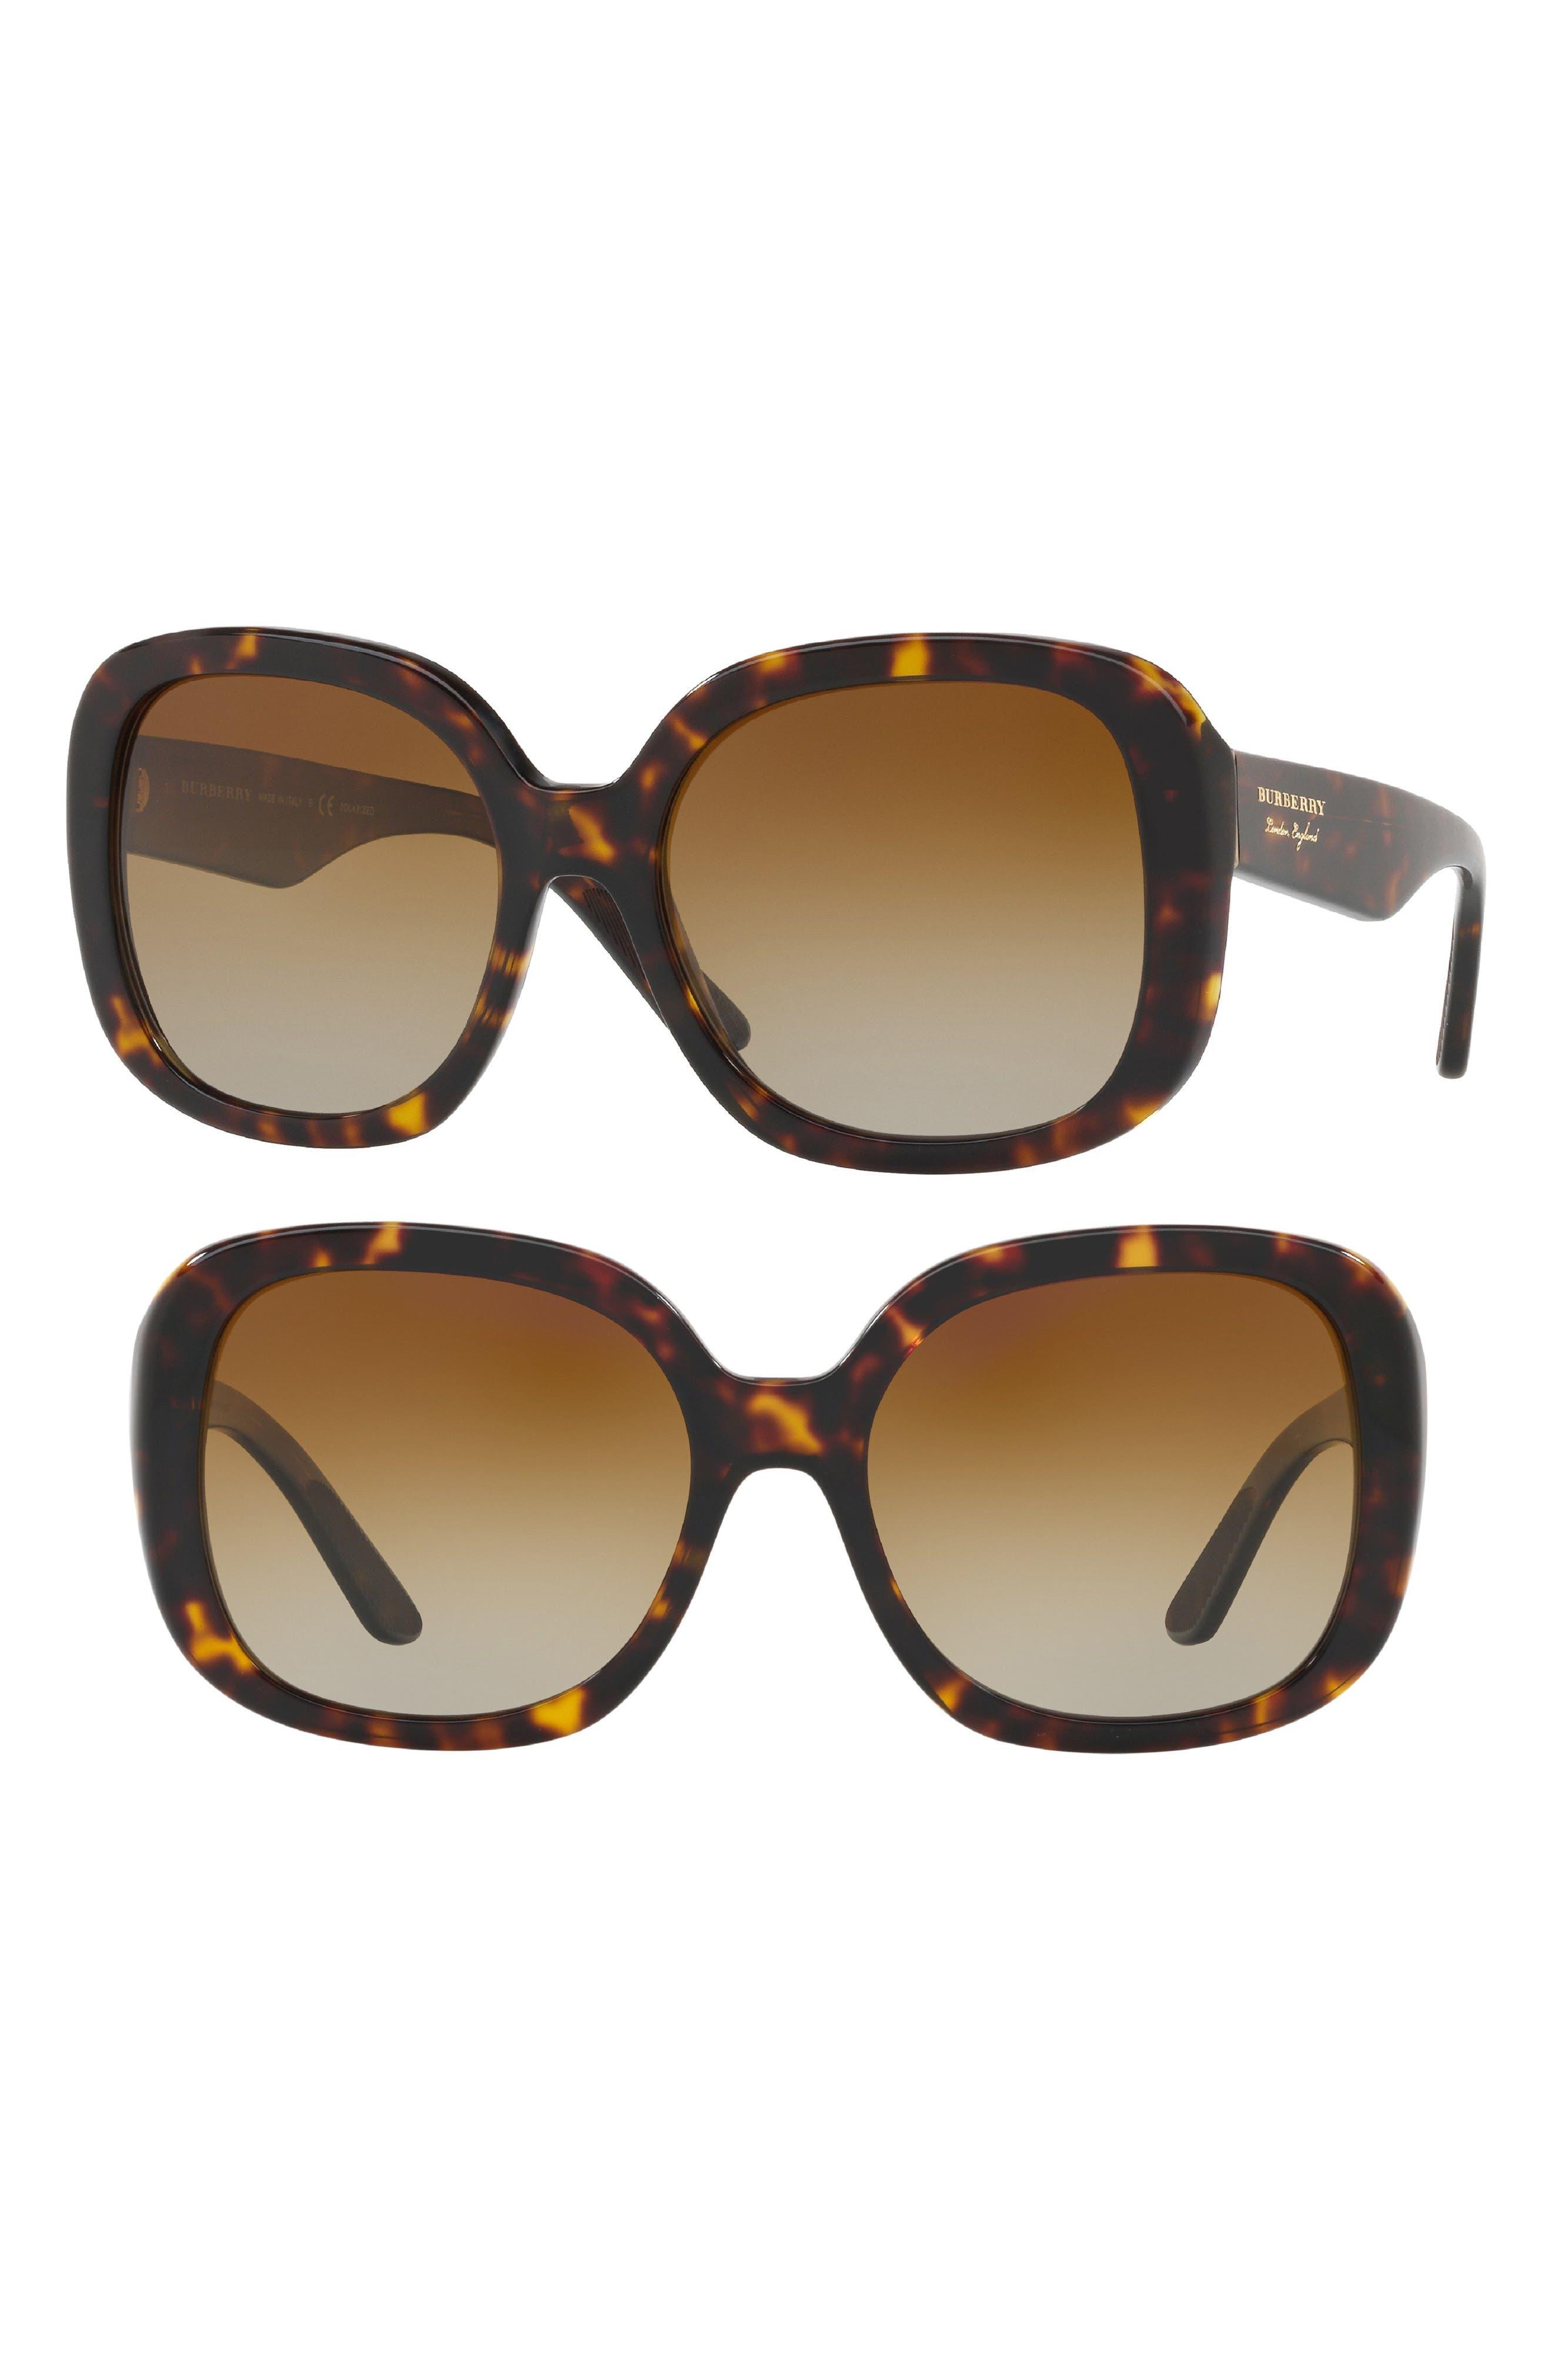 56mm Polarized Sunglasses,                             Main thumbnail 1, color,                             200